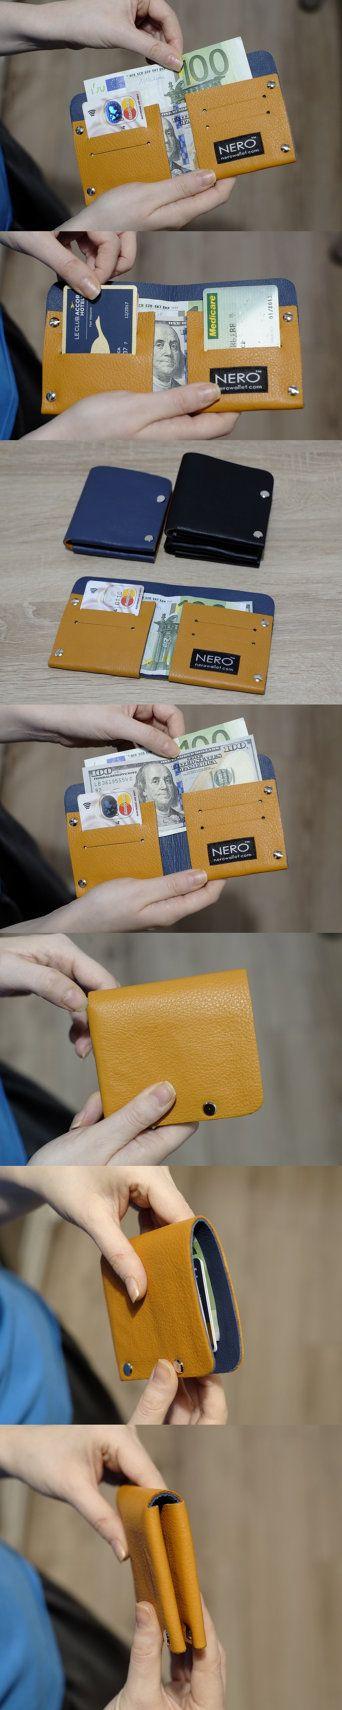 NERO Bifold Wallet - Minimalist Wallet, Mens Wallet, Leather Wallet, Slim Womens Wallet, RFID Blocking - Double Face Reversible Colors